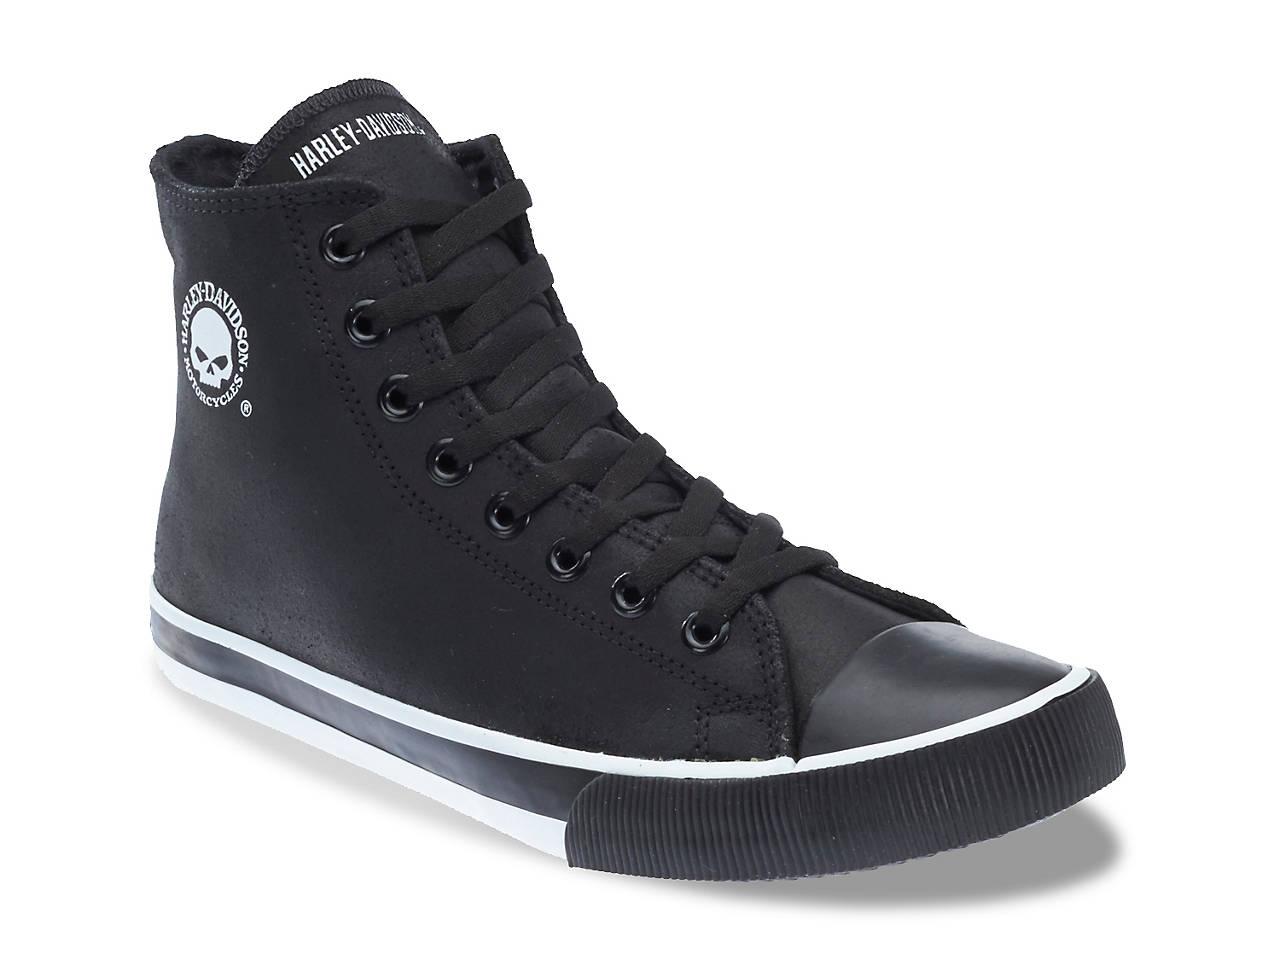 fd6286ff2f50 Harley-Davidson Baxter ll High-Top Sneaker Men s Shoes